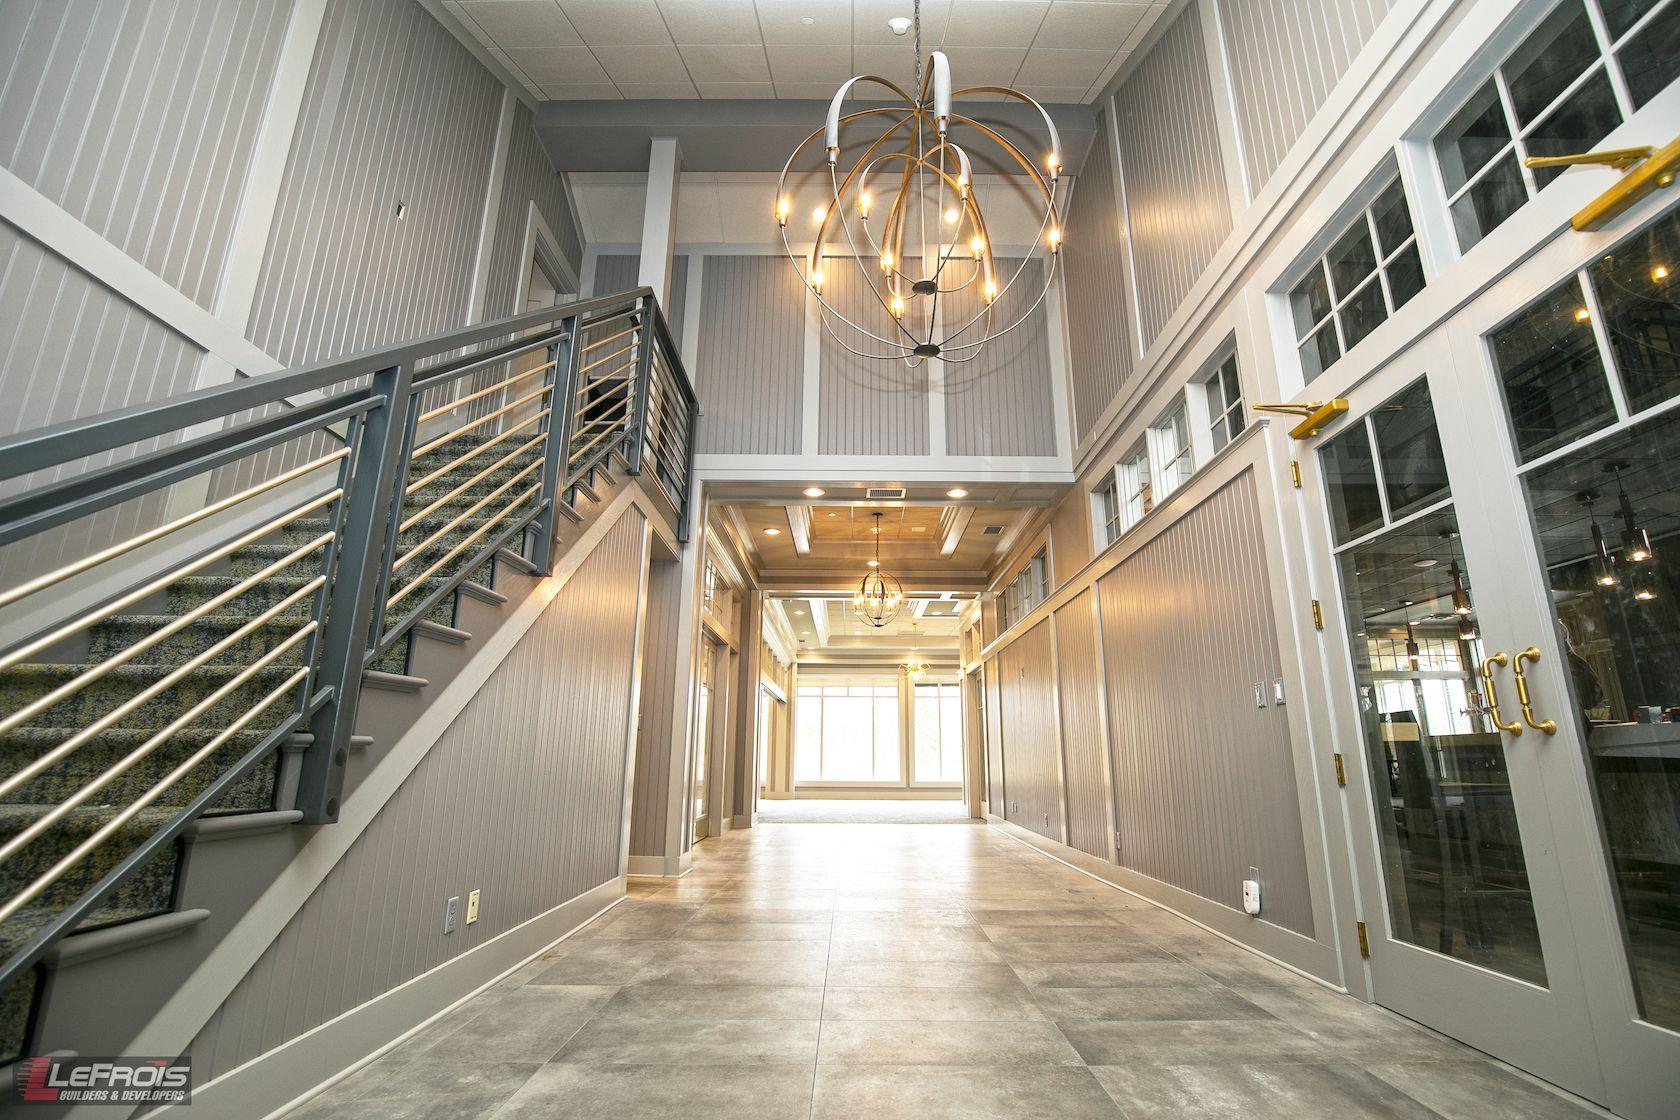 Shadow Lake's new foyer